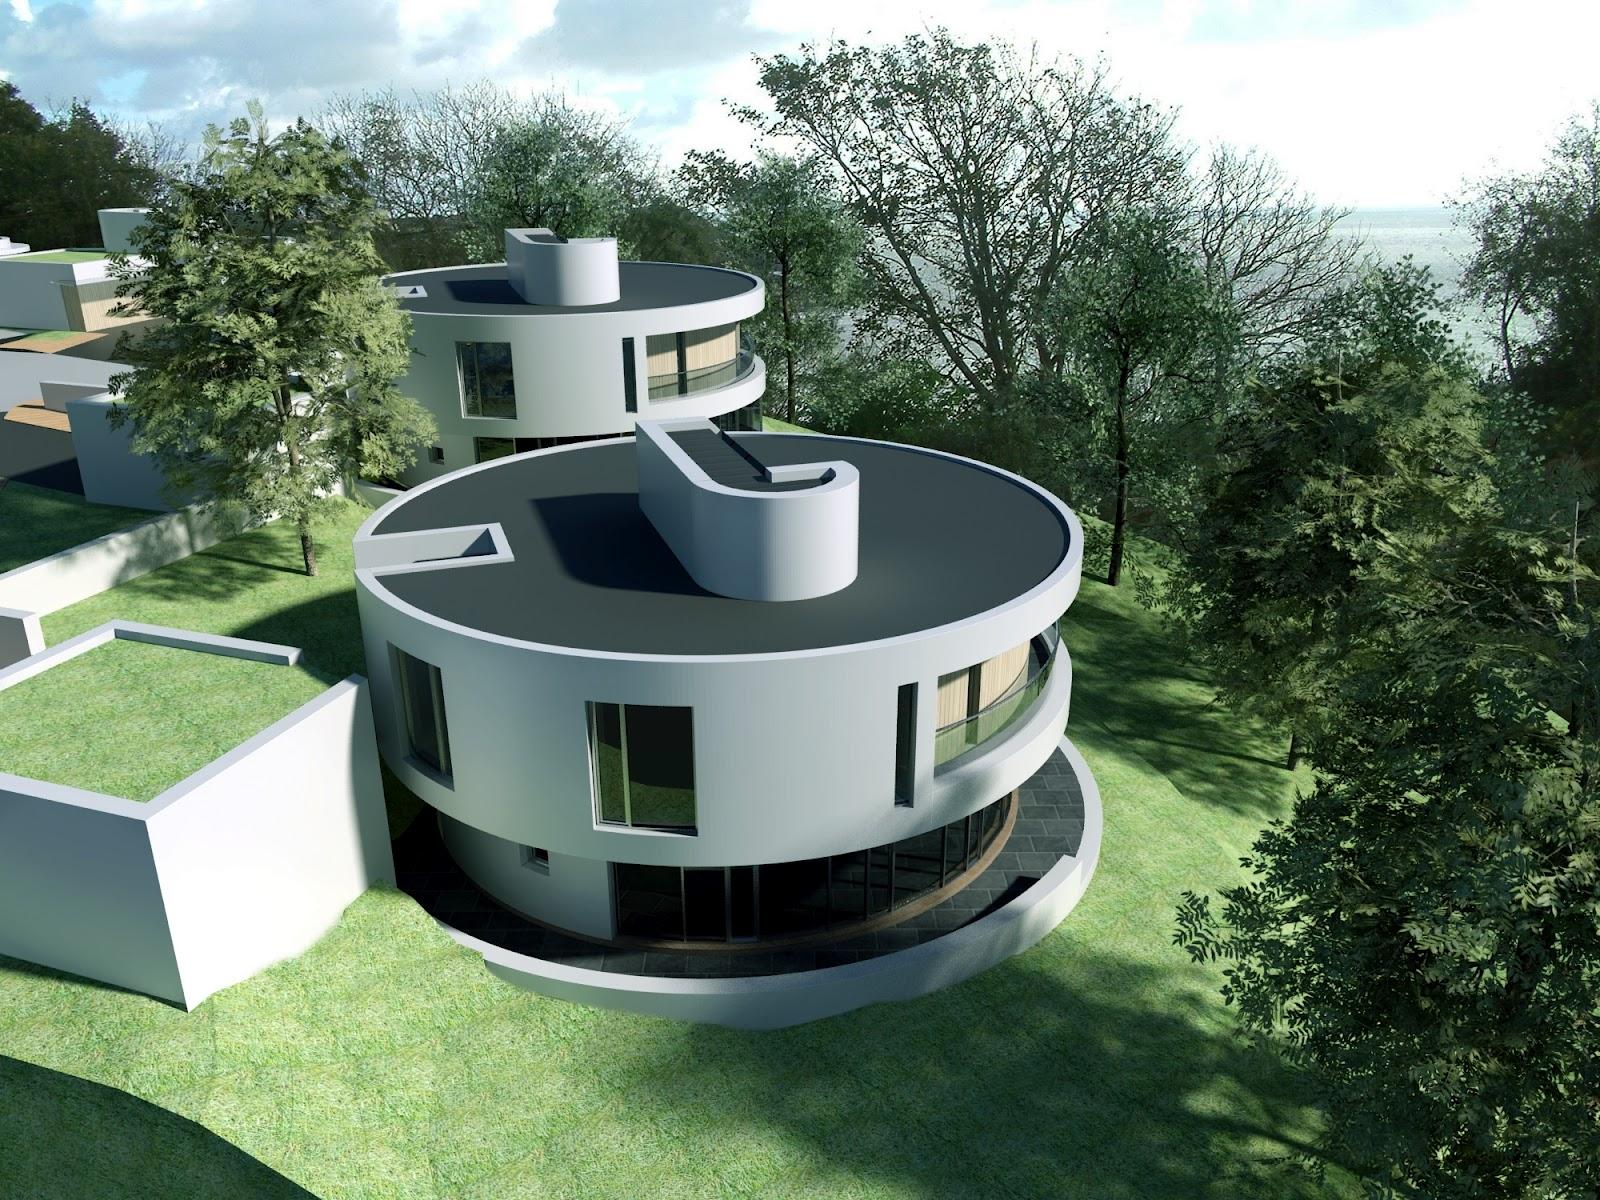 new home designs latest modern unique homes designs. Black Bedroom Furniture Sets. Home Design Ideas